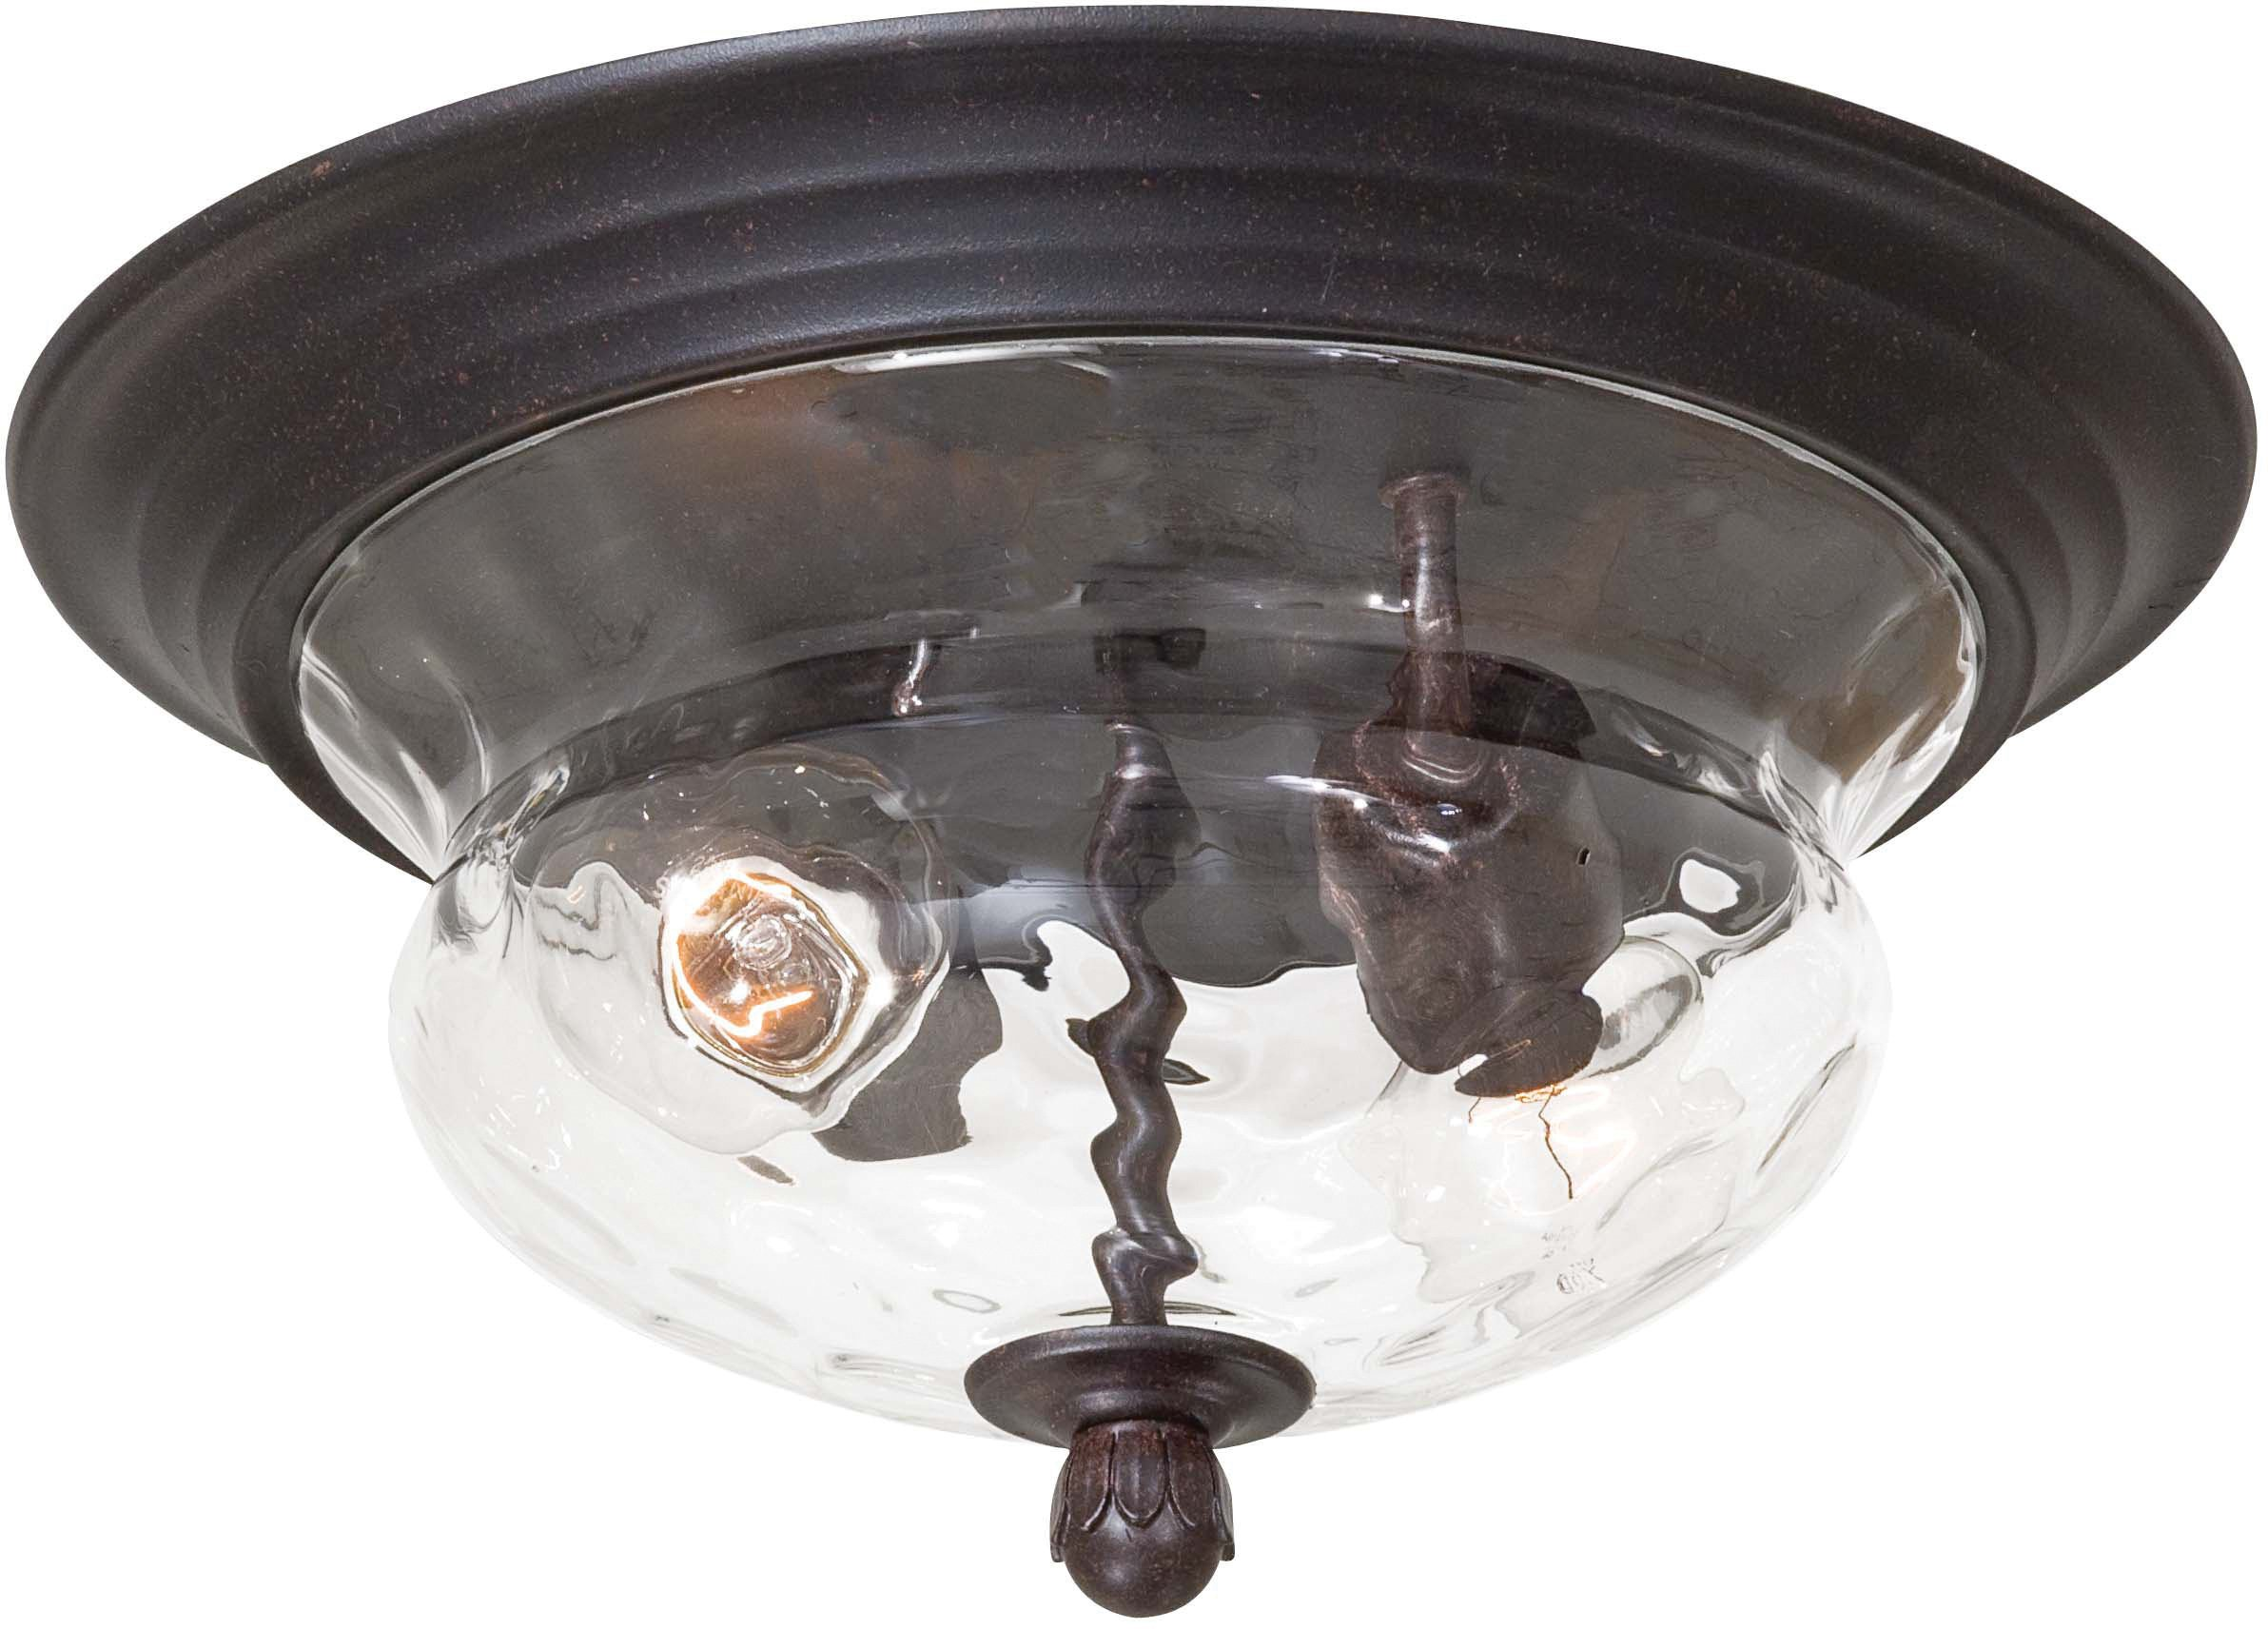 Minka Lavery Outdoor Ceiling Lighting 8769-166, Merrimack Cast Aluminum Flush Mount, 120 Watts, Bronze